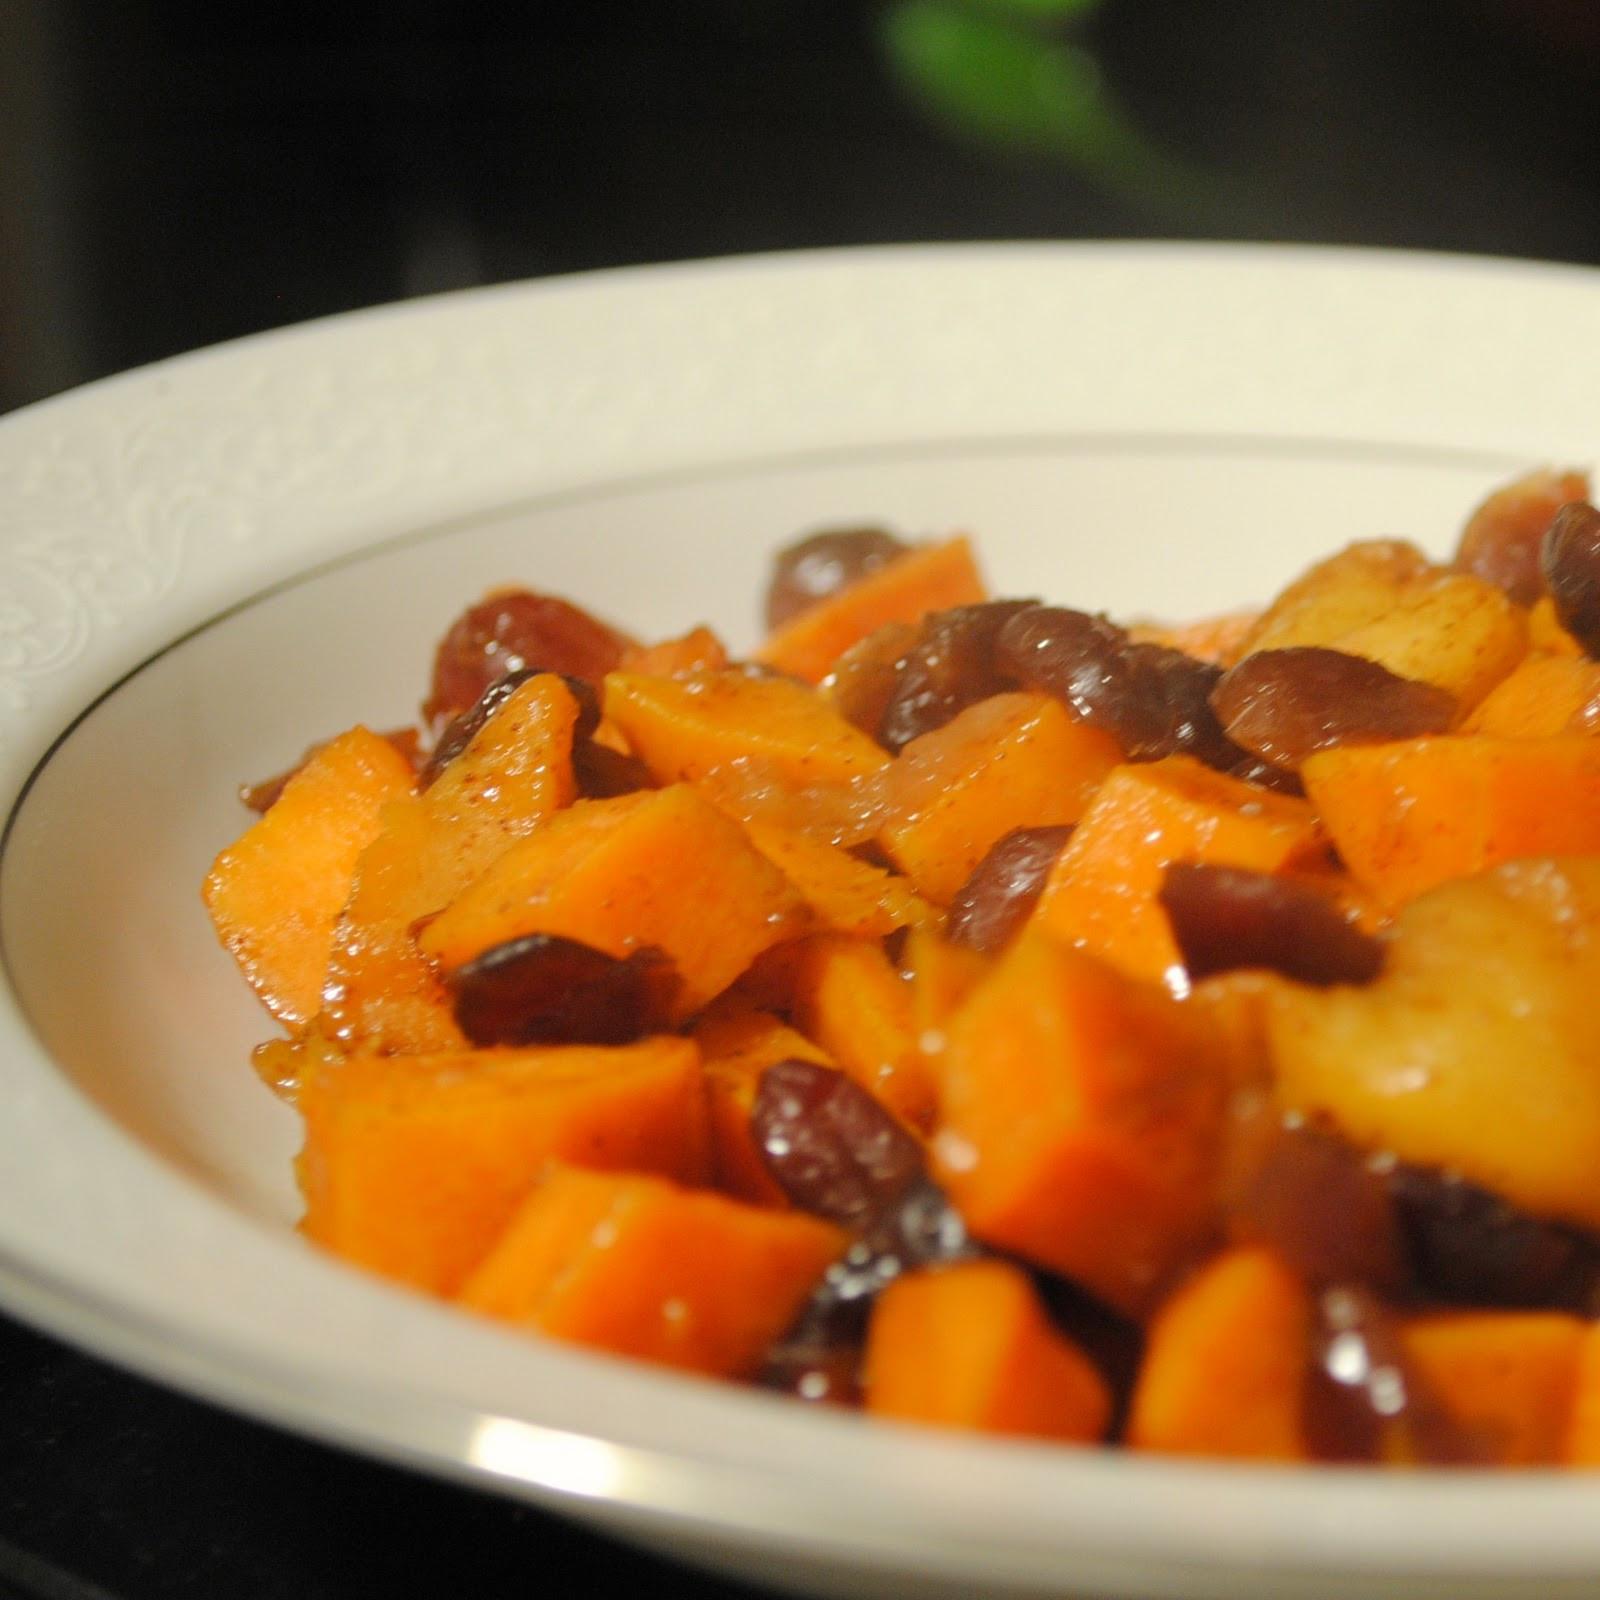 Sweet Potato Bake  Homemade By Holman Sweet Potato Bake A Healthier Way